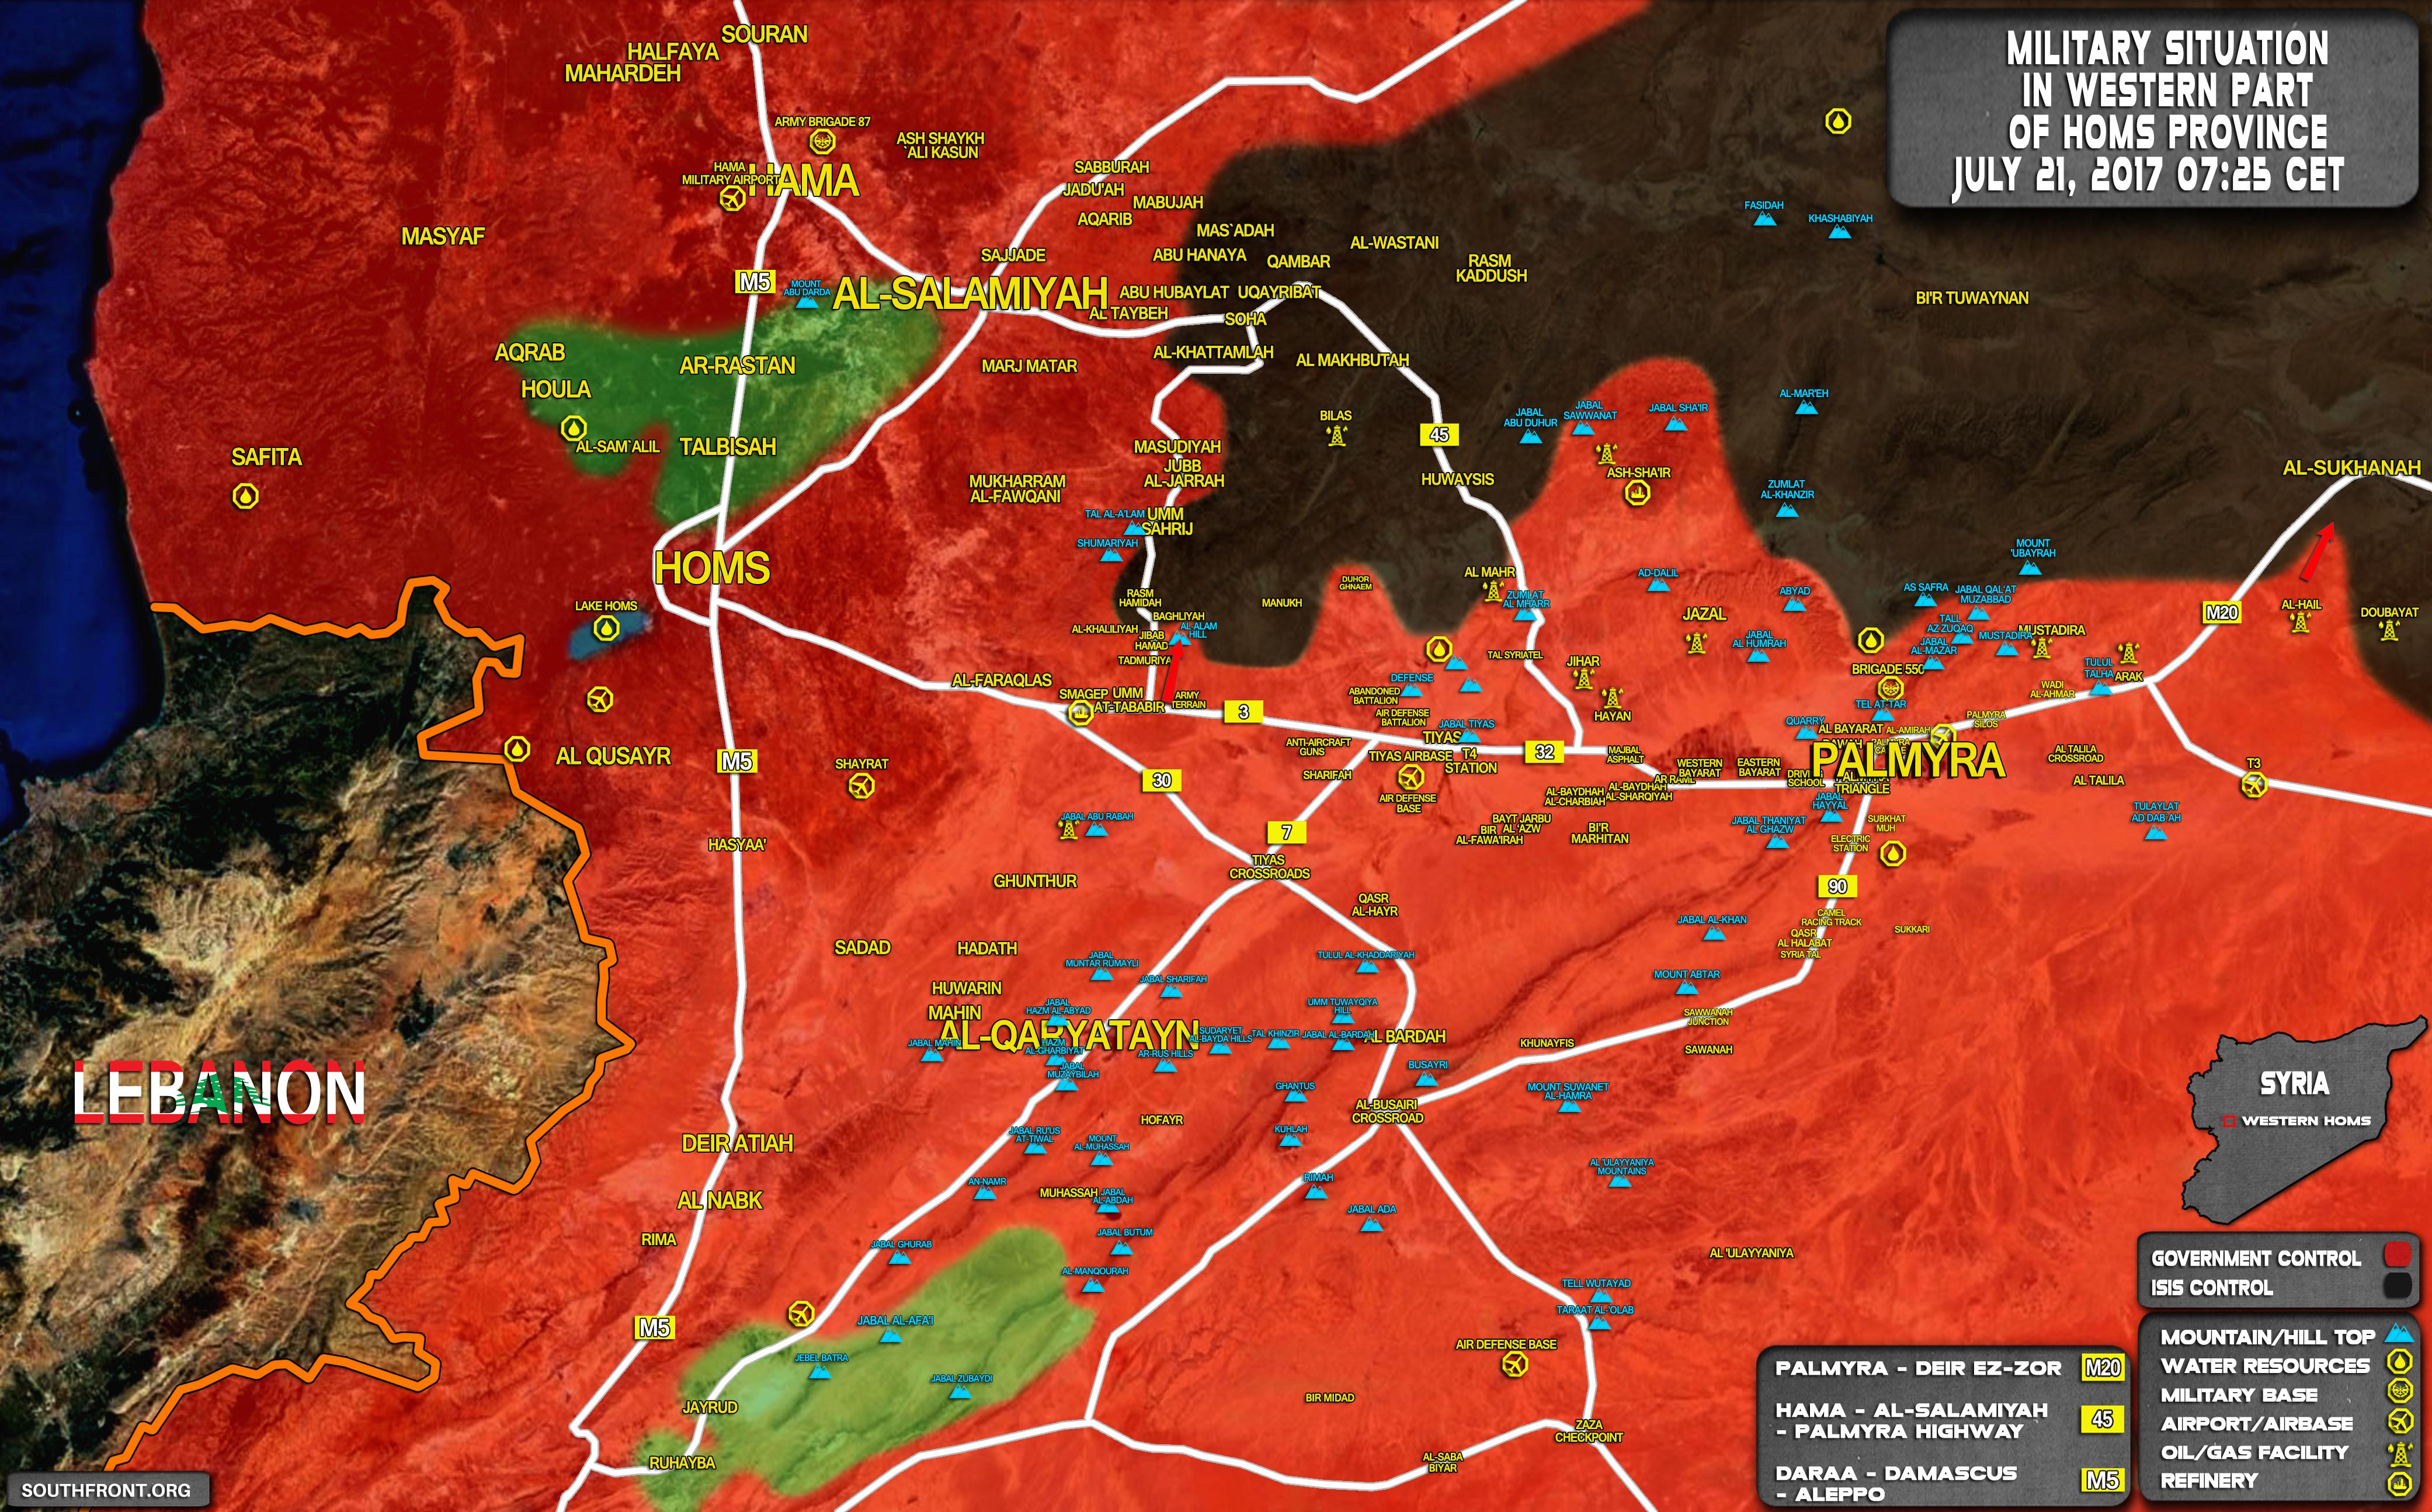 BREAKING - [BIZTPOL] Szíria és Irak - 6. - Page 18 21july_07_25_Homs_Province_Syria_War_Map